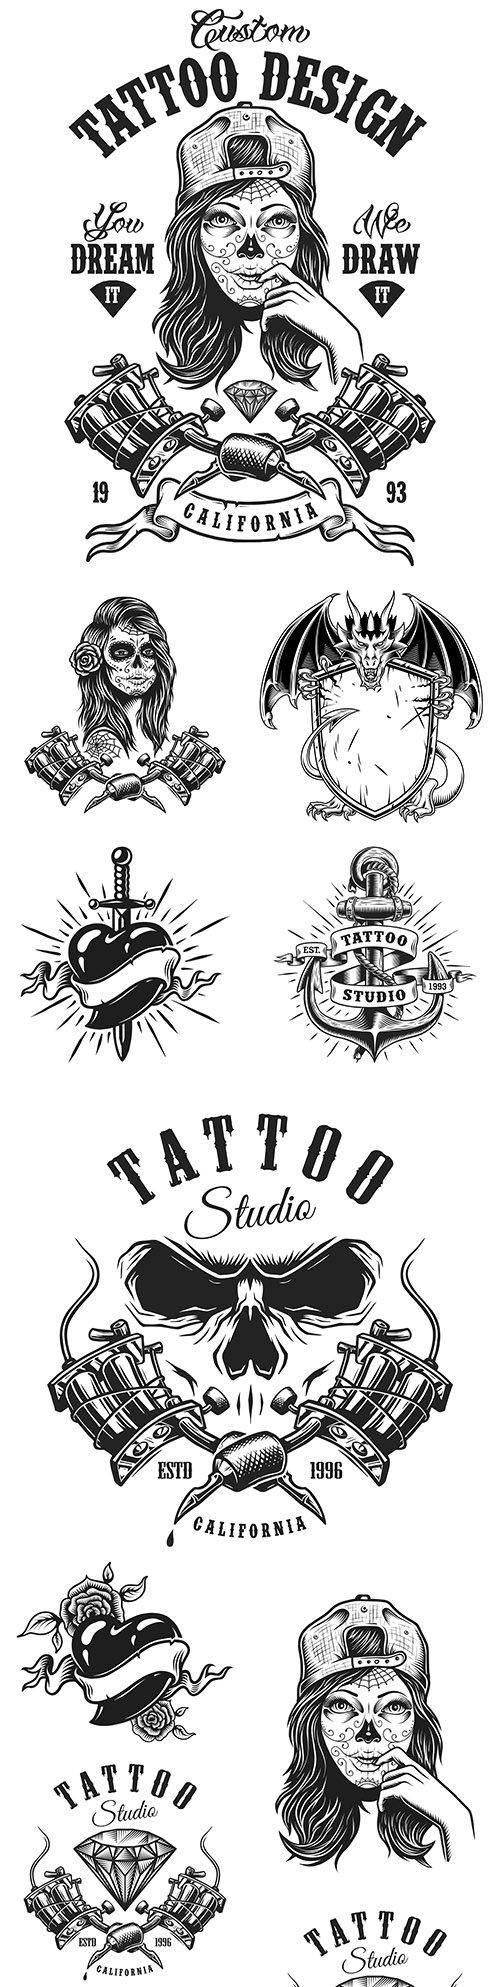 Vintage monochrome tattoo design emblem